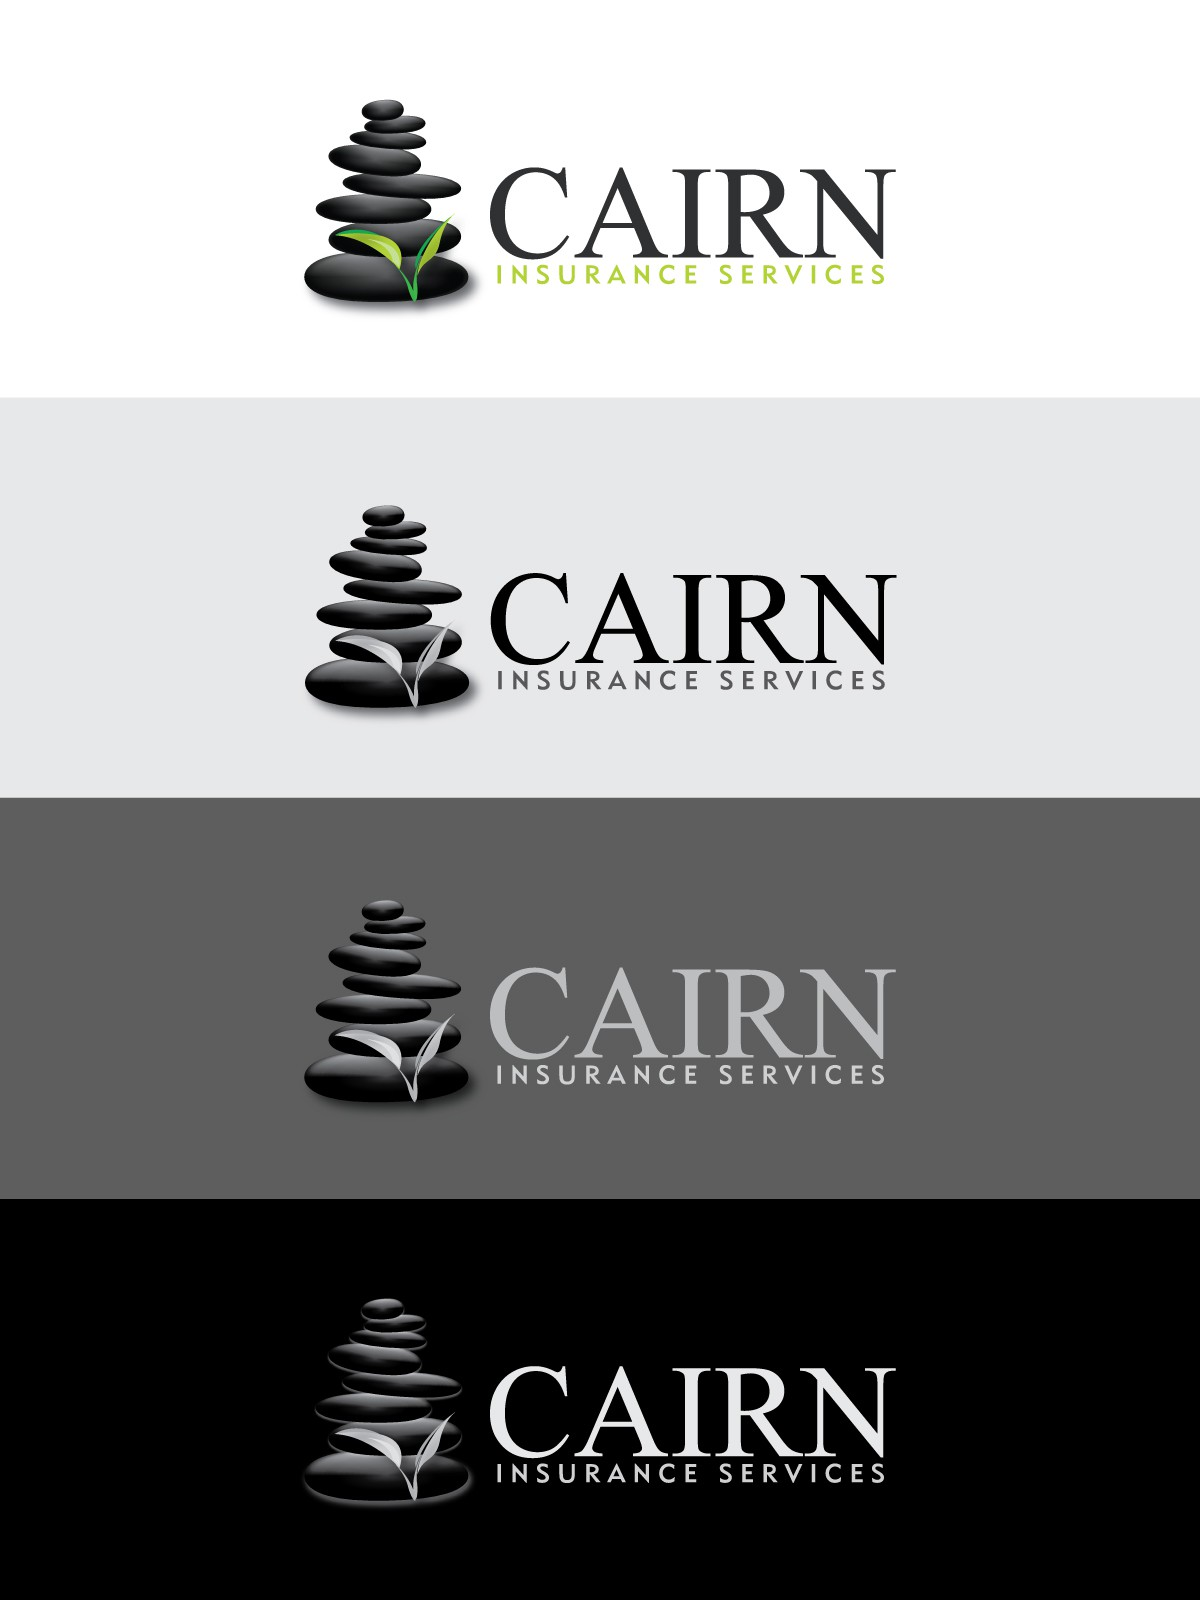 Cairn Insurance Services needs a new logo